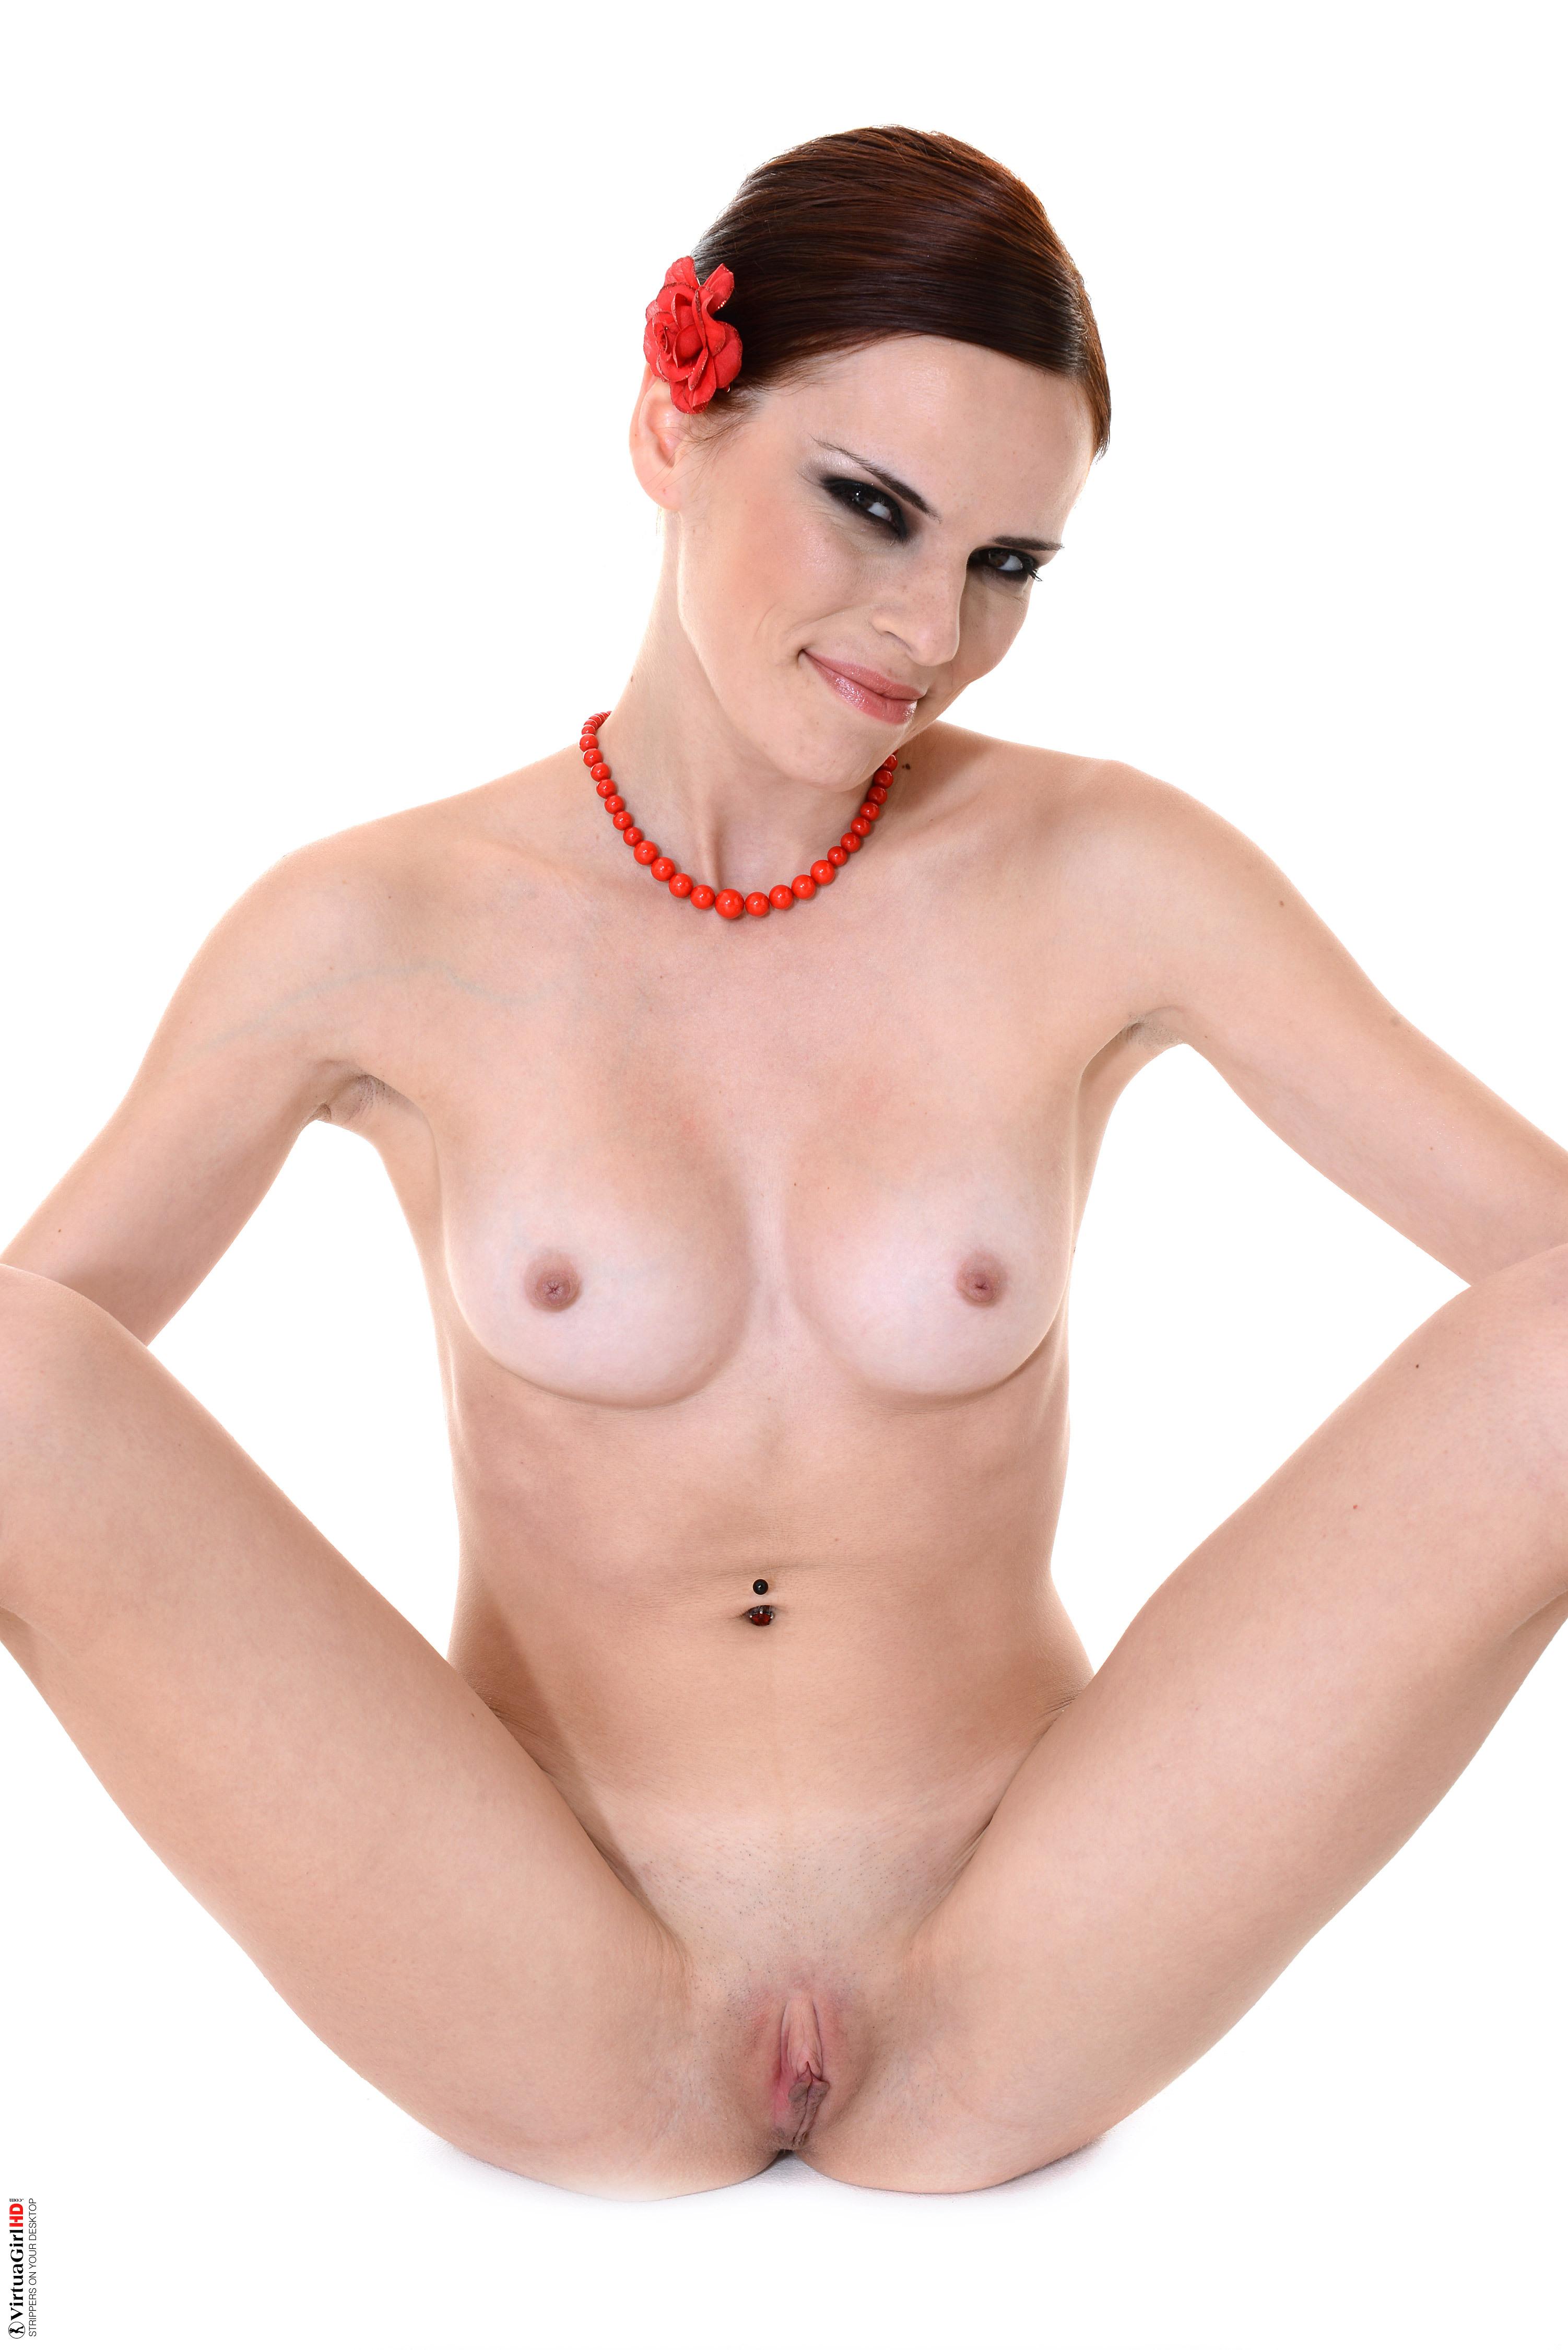 boobs wallpaper